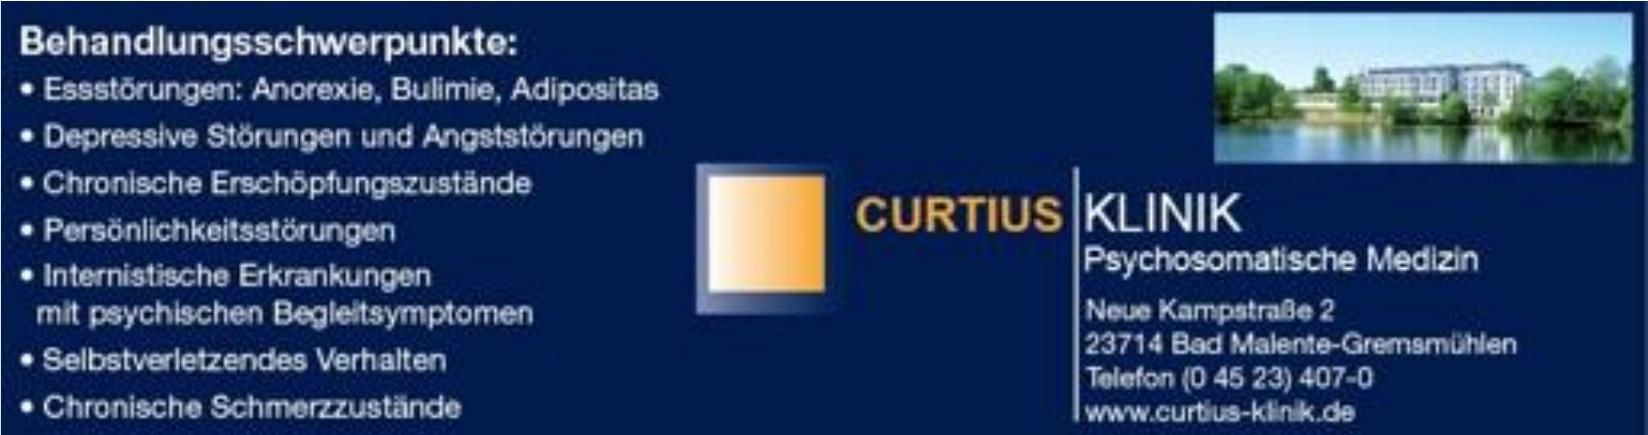 Curtius Klinik Psychosomatische Medizin